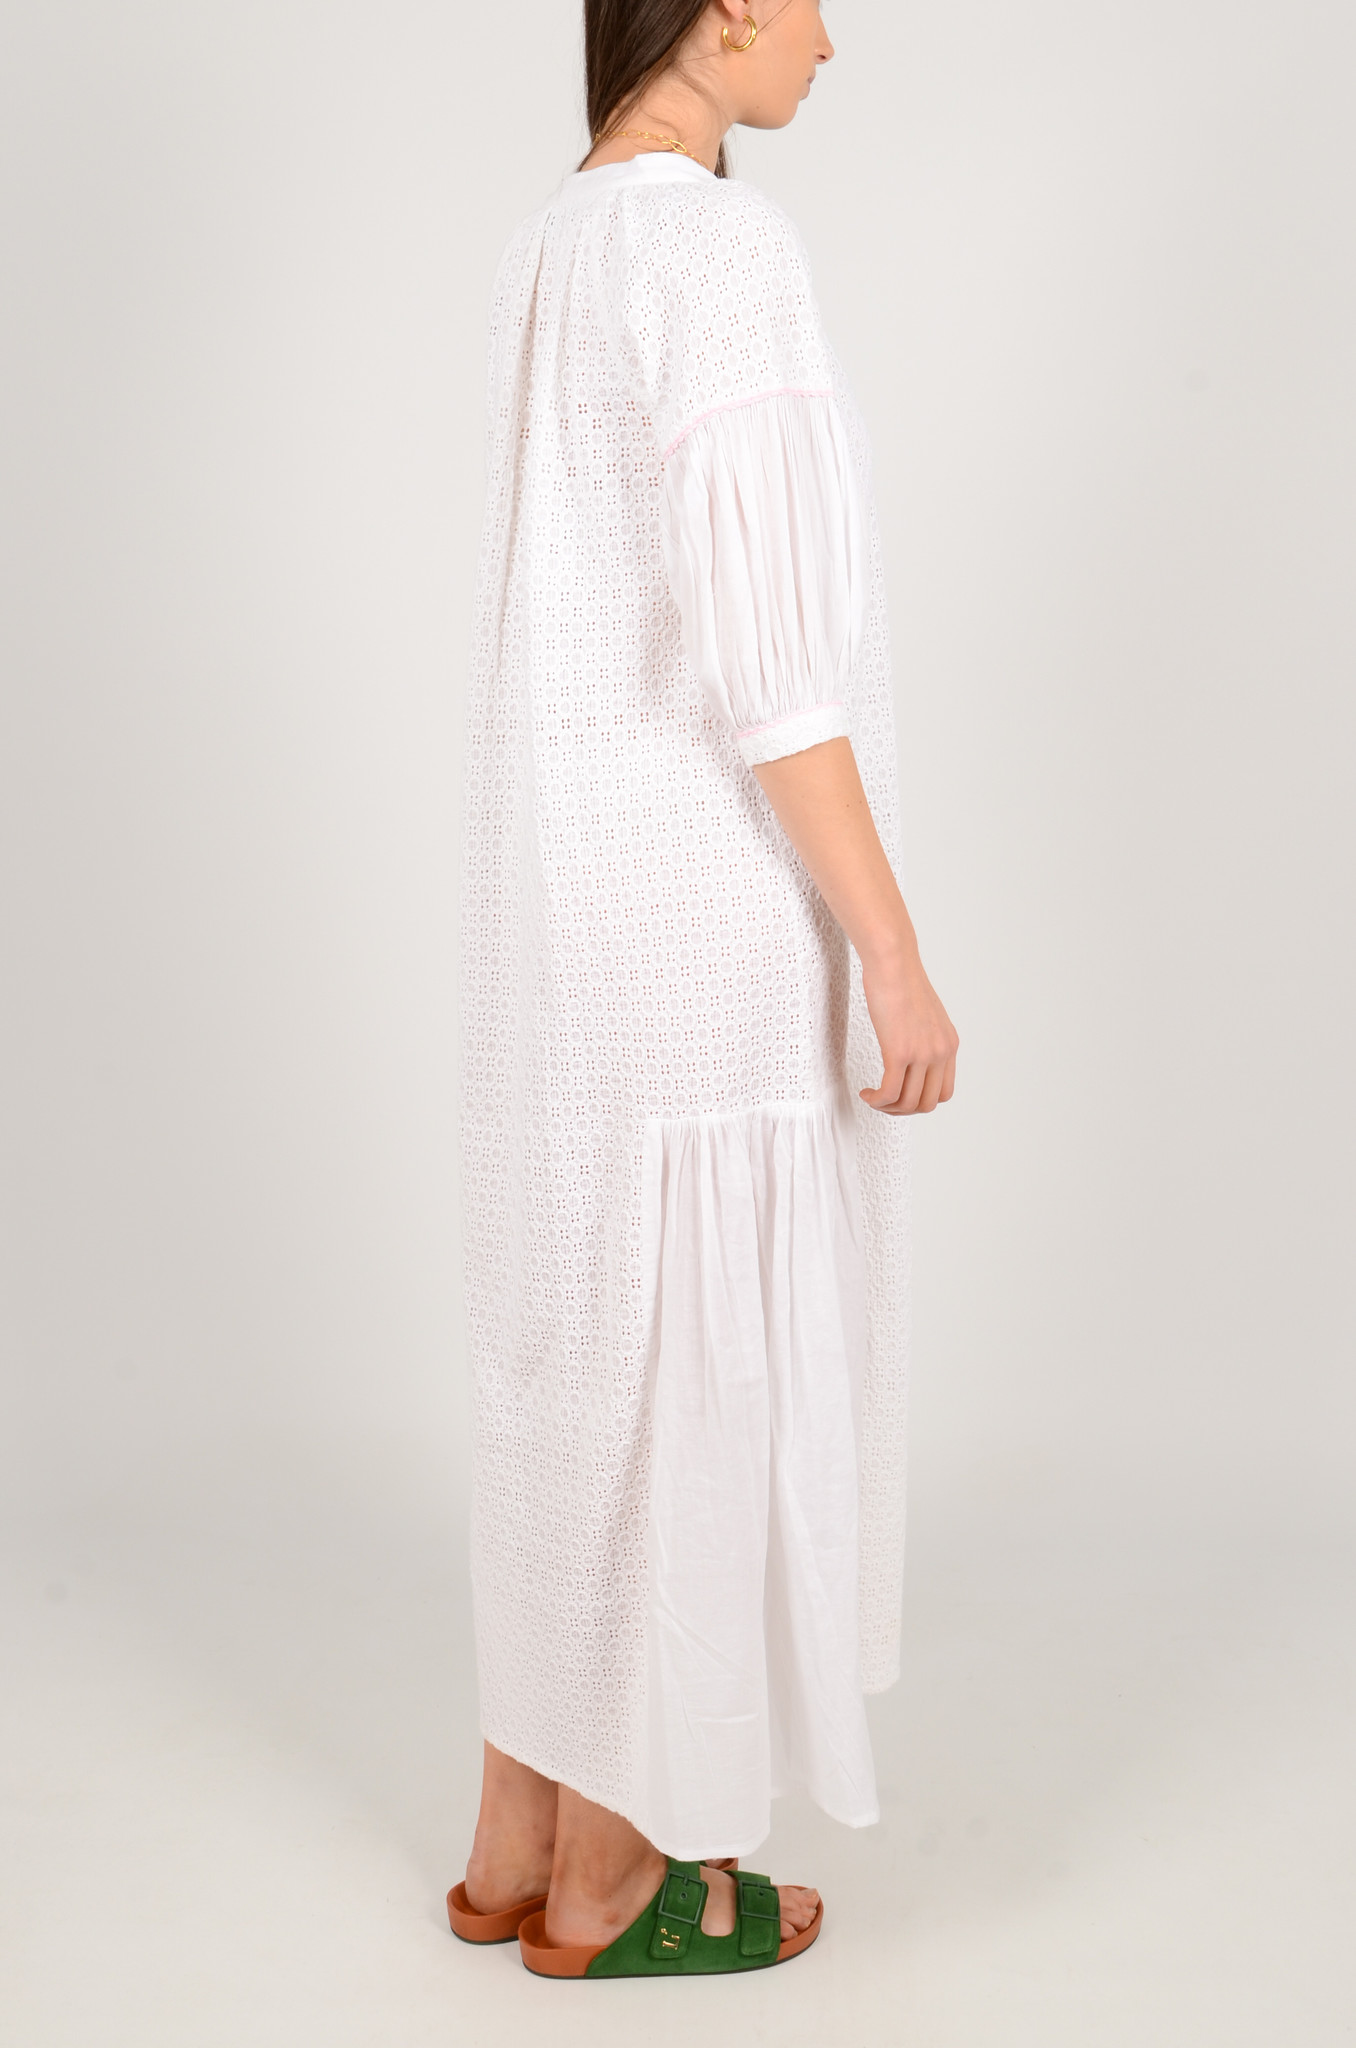 MANISE DRESS-4